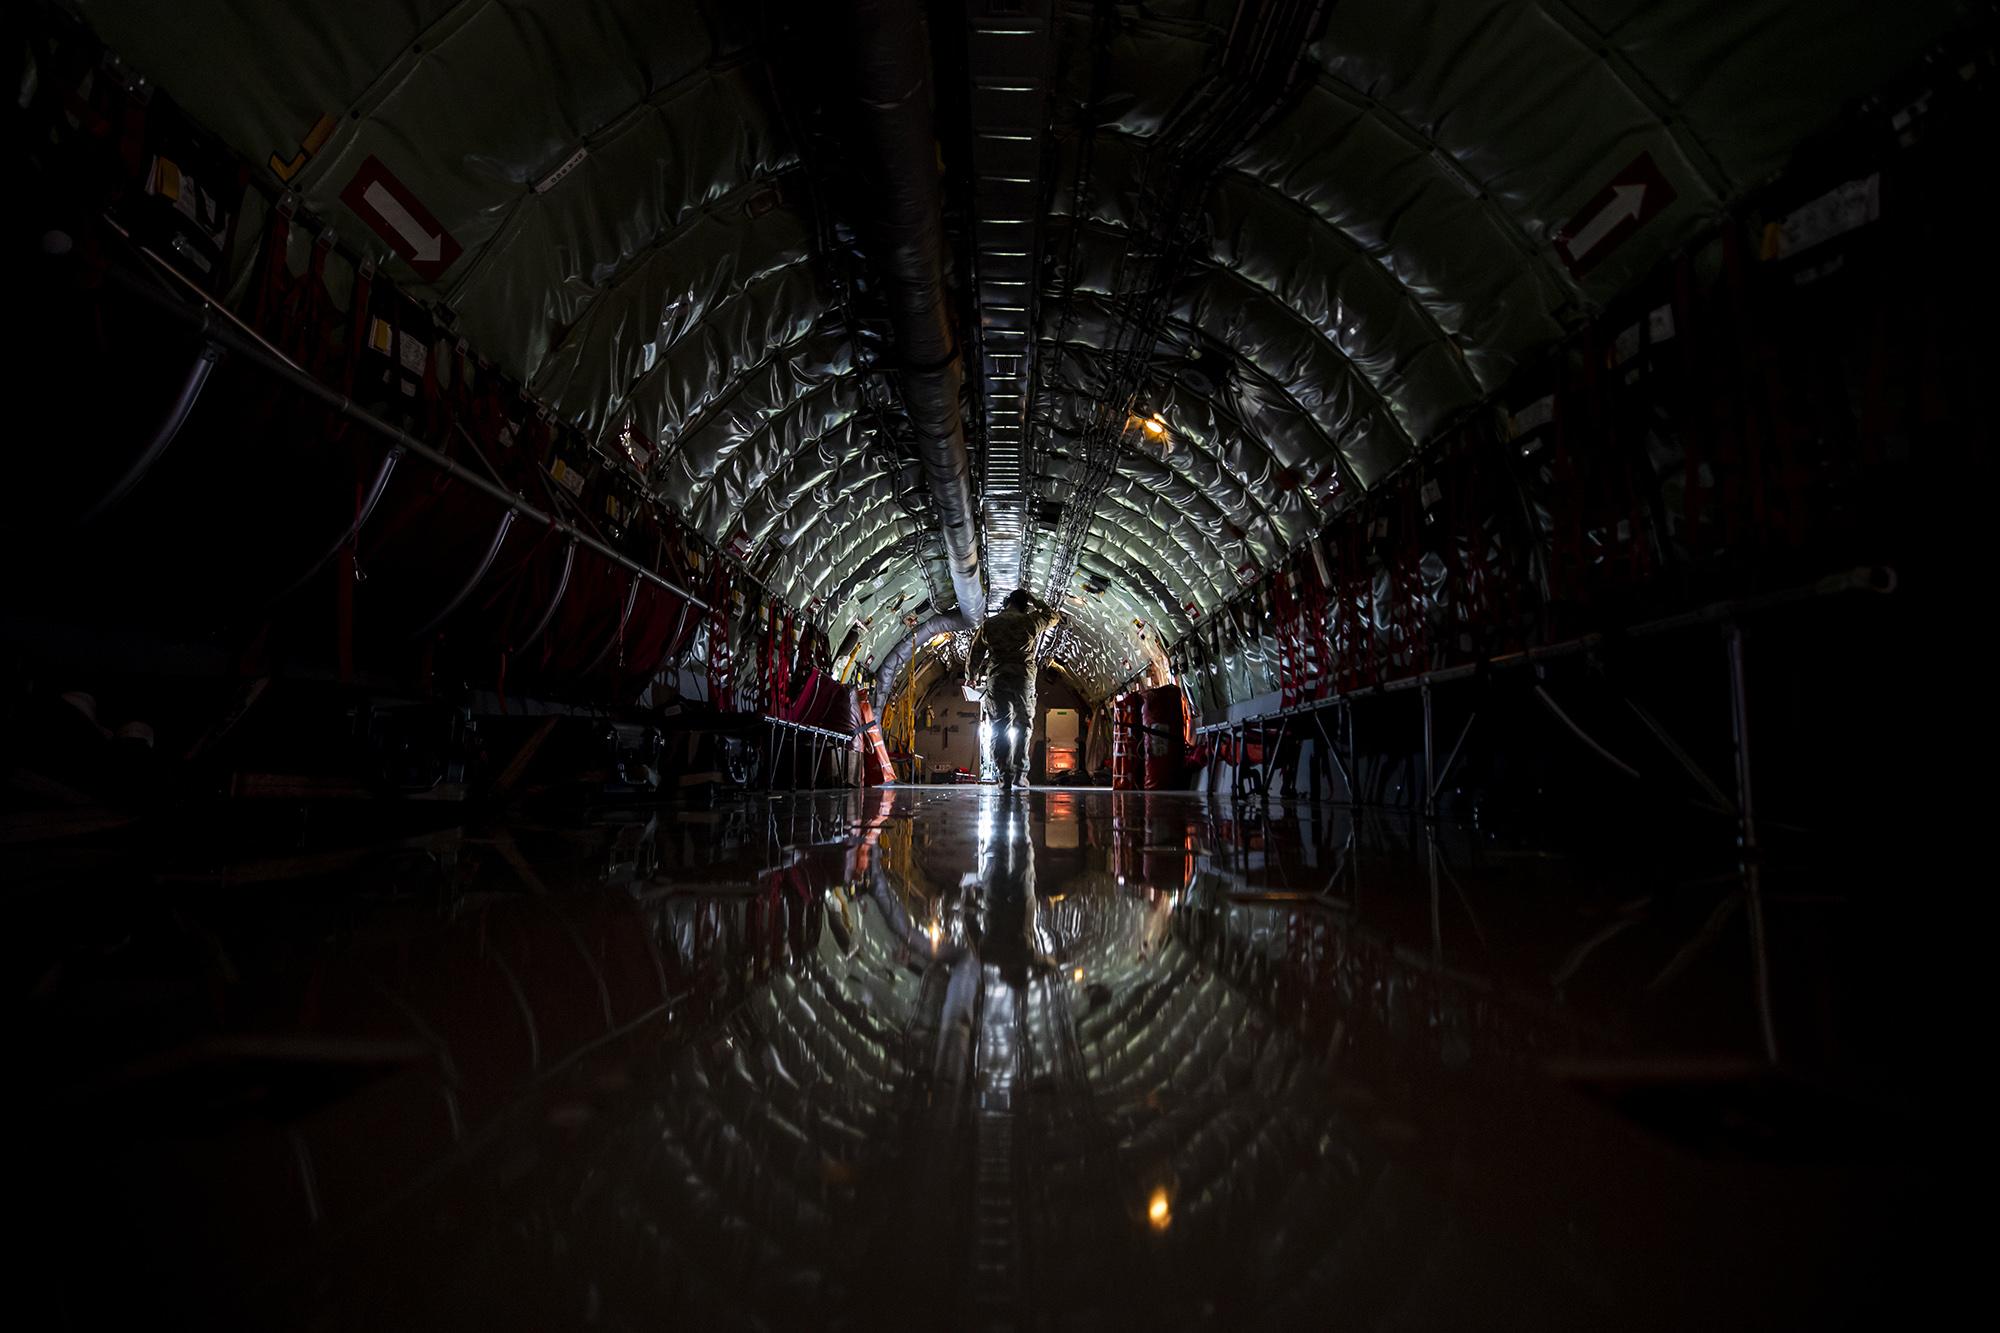 Tech. Sgt. Vince Stokes, 141st Air Refueling Squadron book operator, walks through a KC-135R Stratotanker at Fairchild Air Force Base, Wash., May 6, 2021. (Master Sgt. Matt Hecht/Air National Guard)